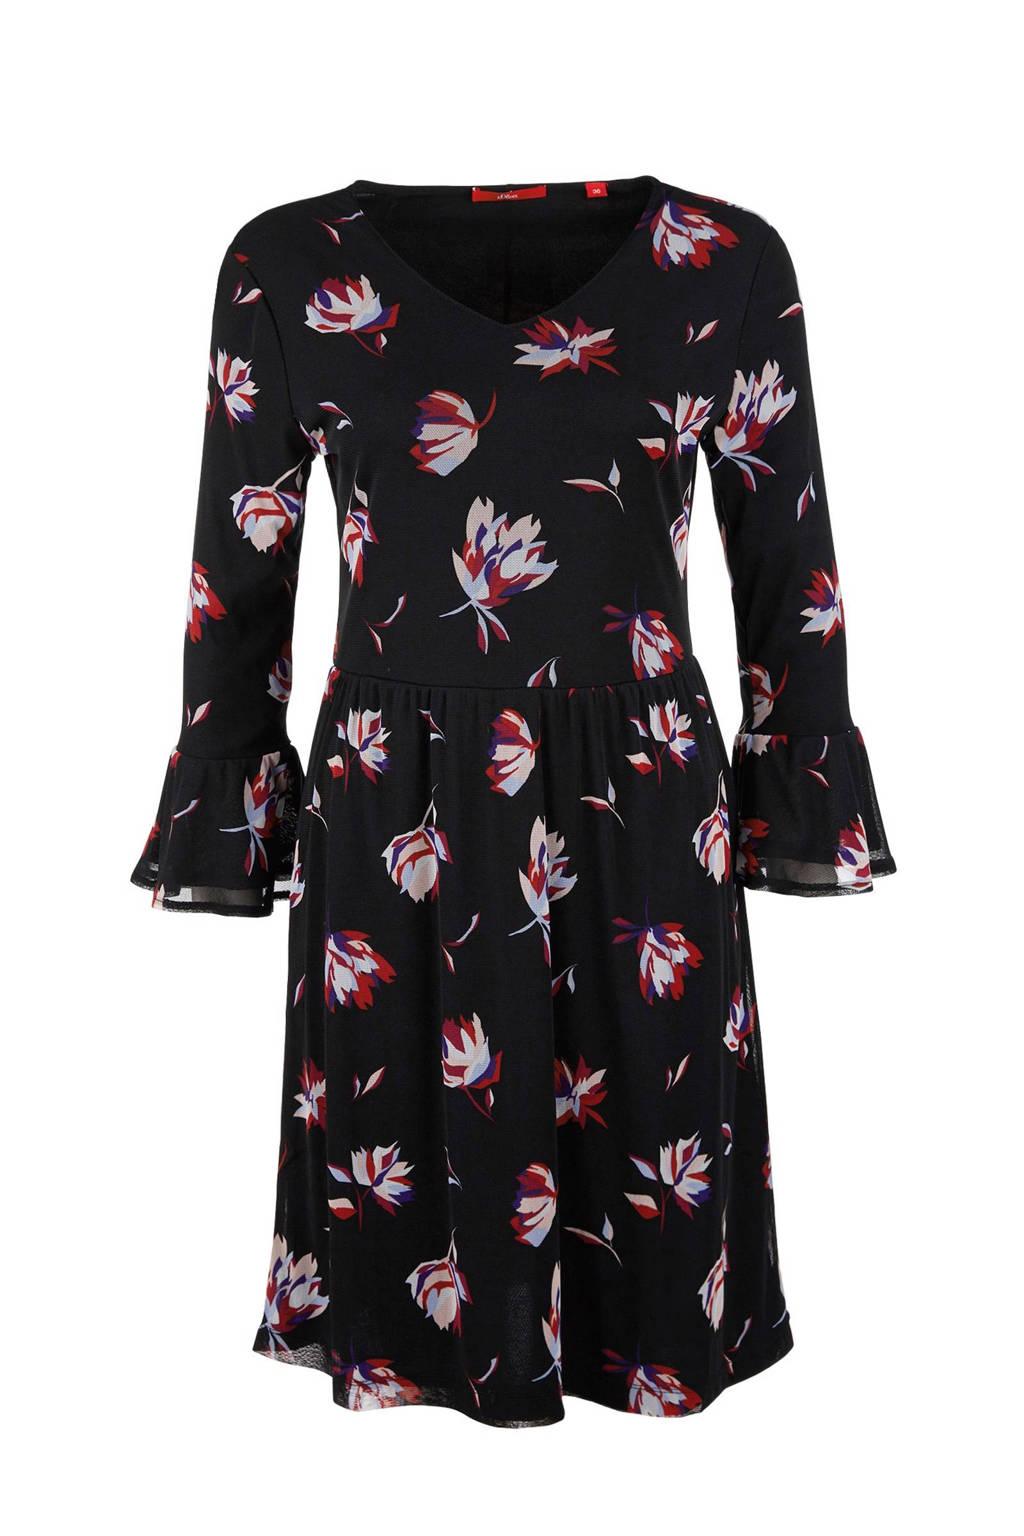 s.Oliver bloemen jurk, Zwart